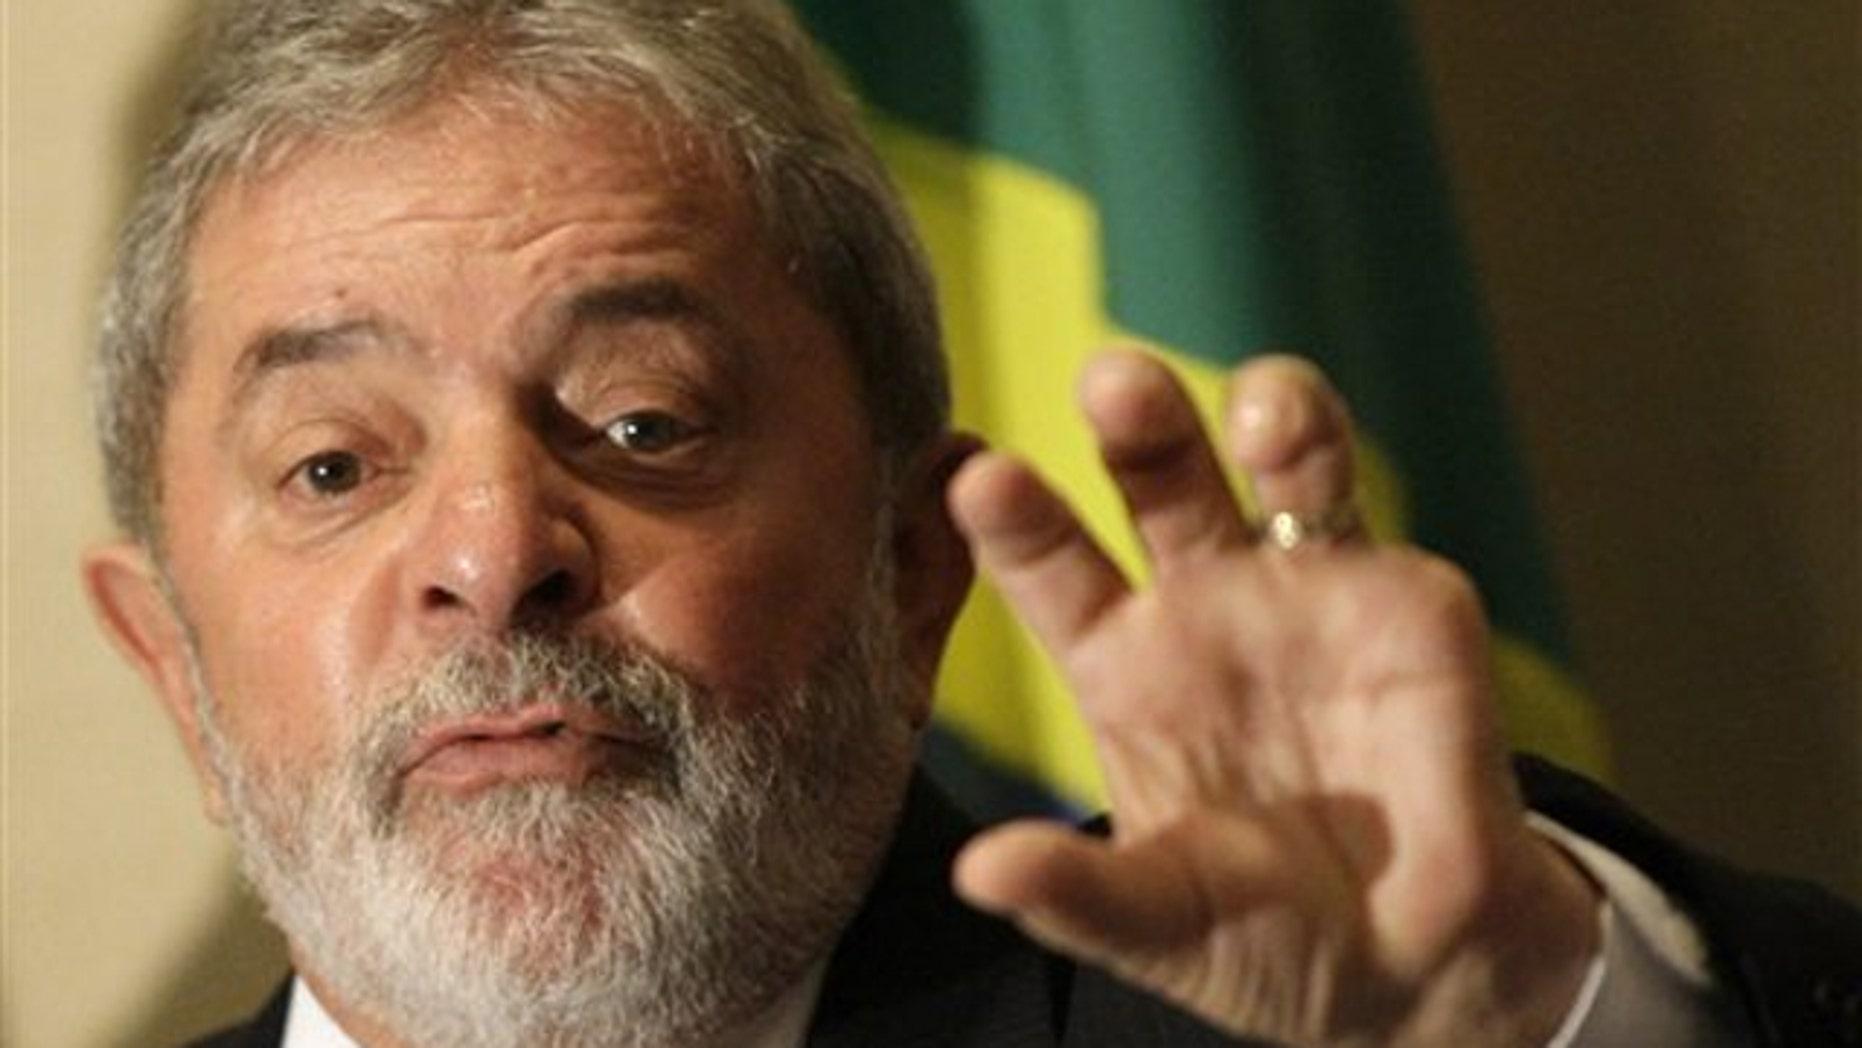 Brazil's President Luiz Inacio Lula da Silva gestures during a press conference in Rio de Janeiro Dec. 3. (AP Photo)